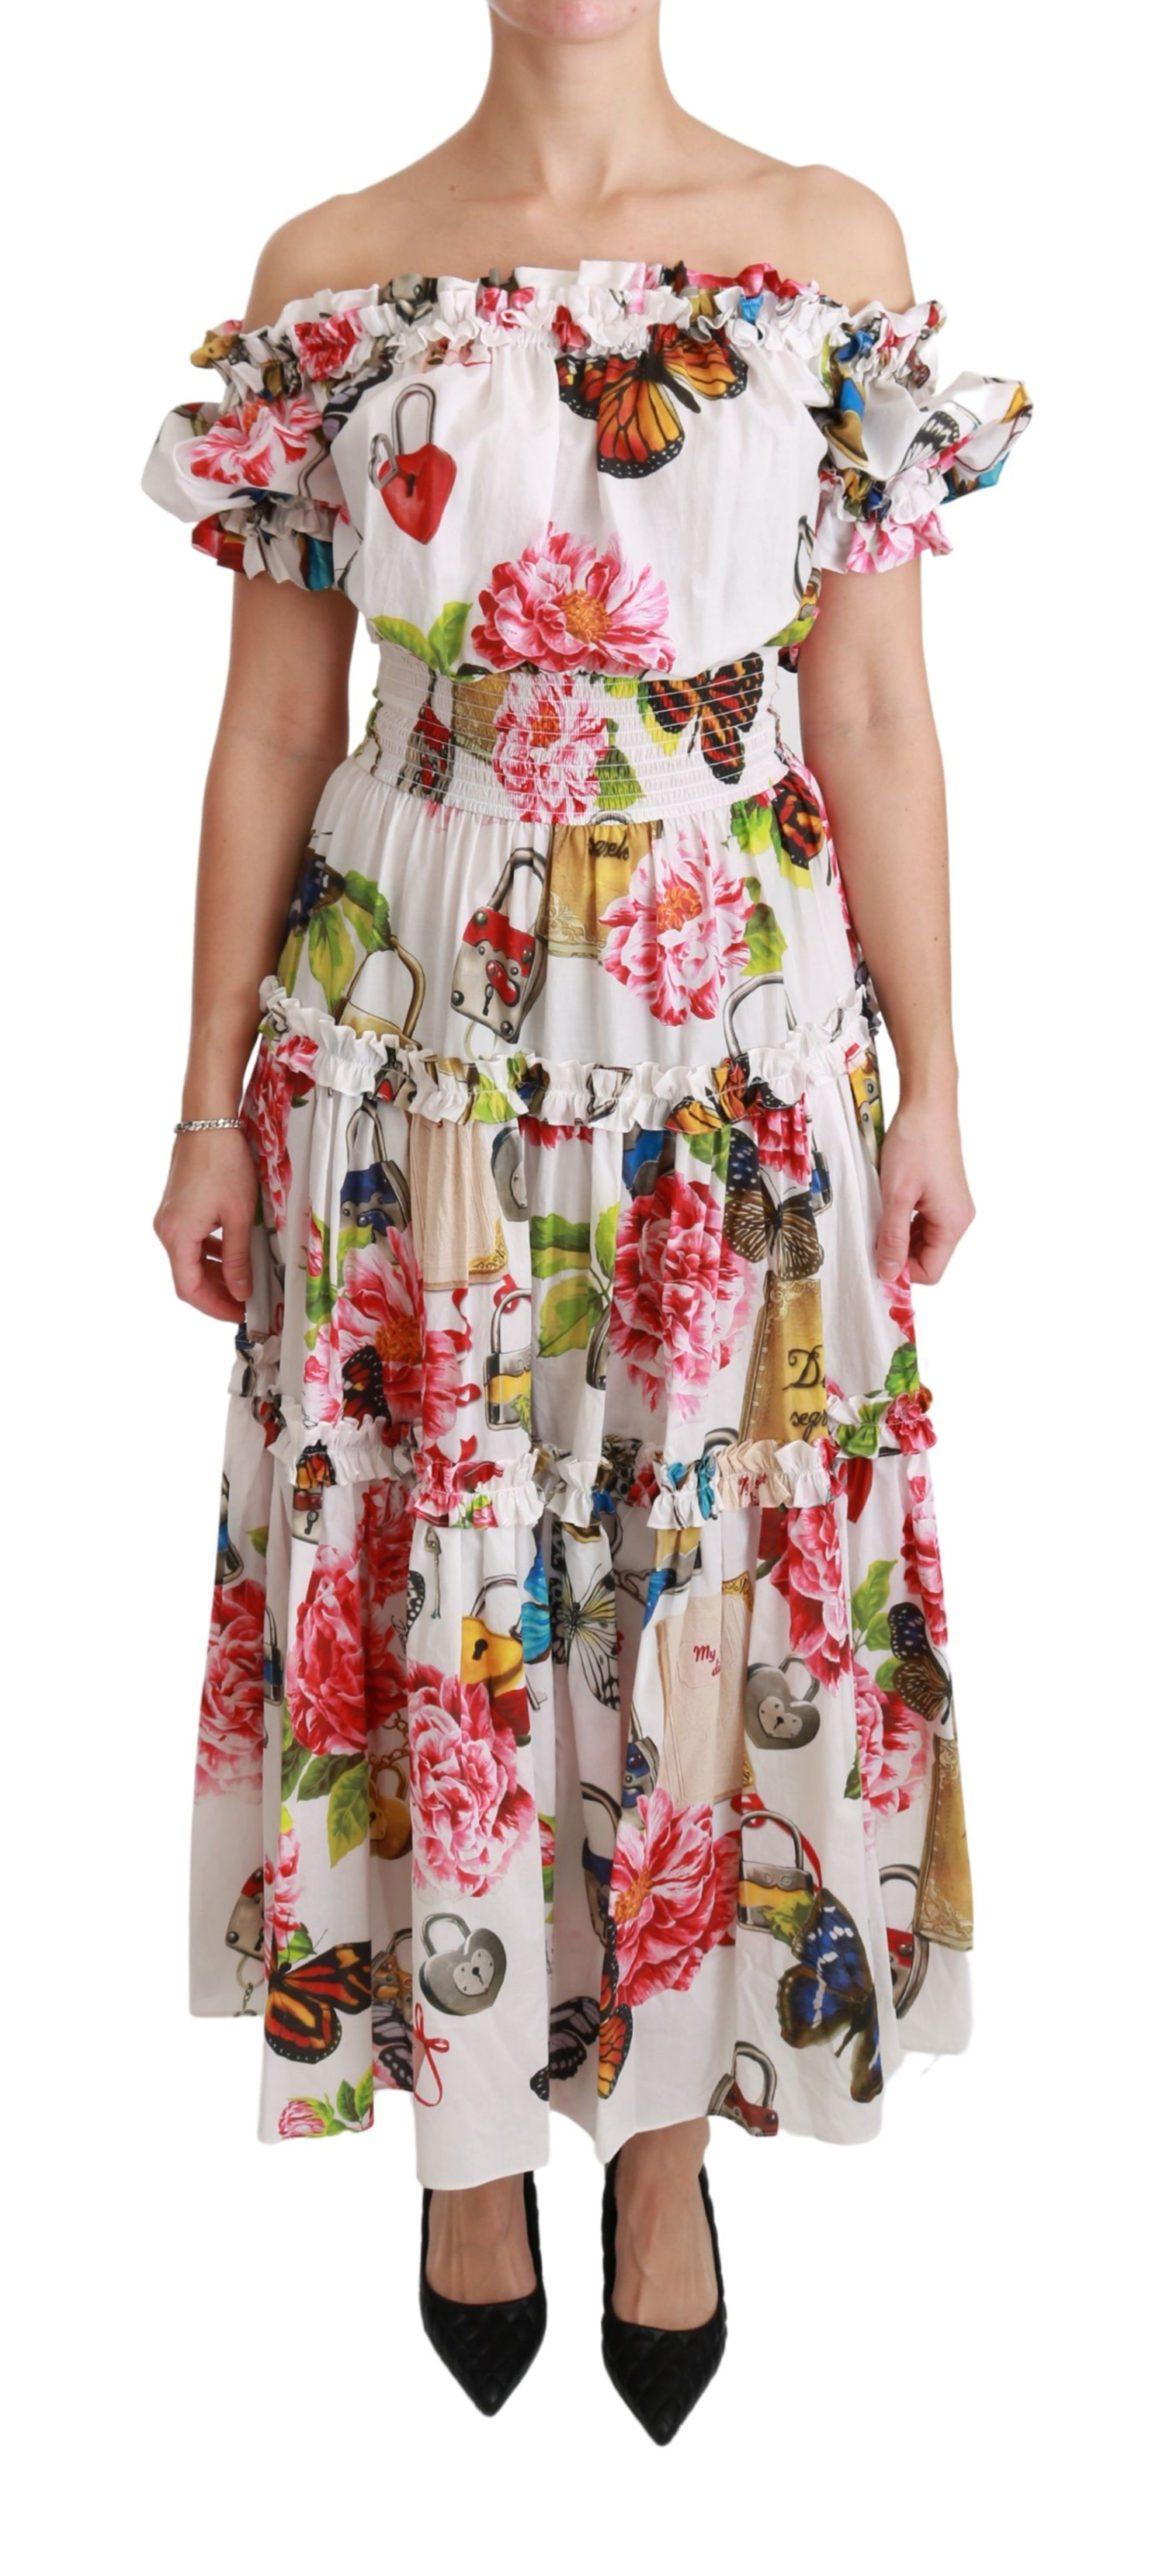 Dolce & Gabbana Women's Cotton Fairy Tale Dress White DR2455 - IT38|XS